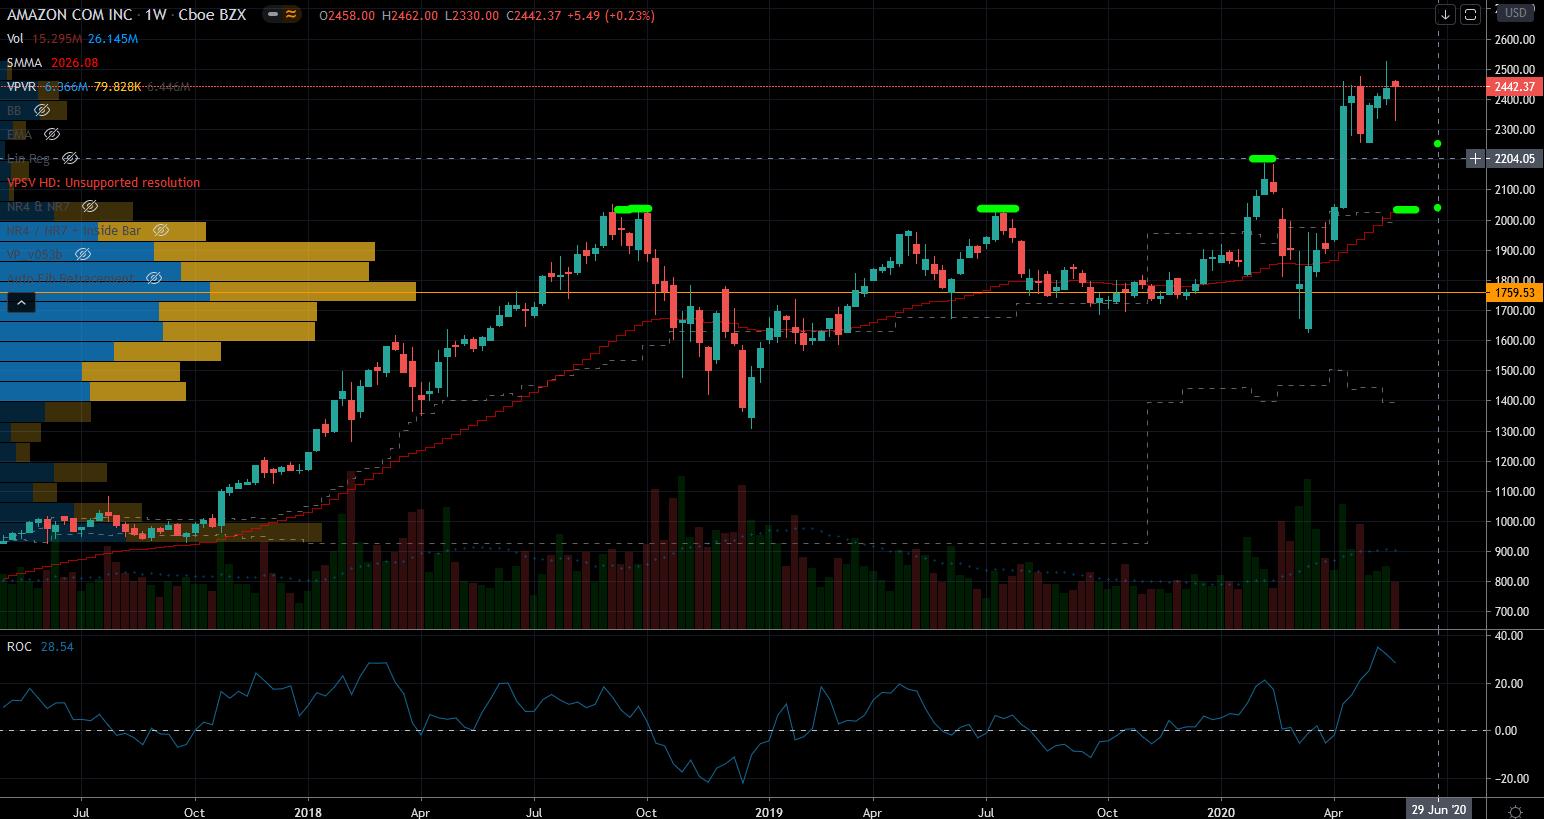 Fang Stocks: AMZN Stock Chart